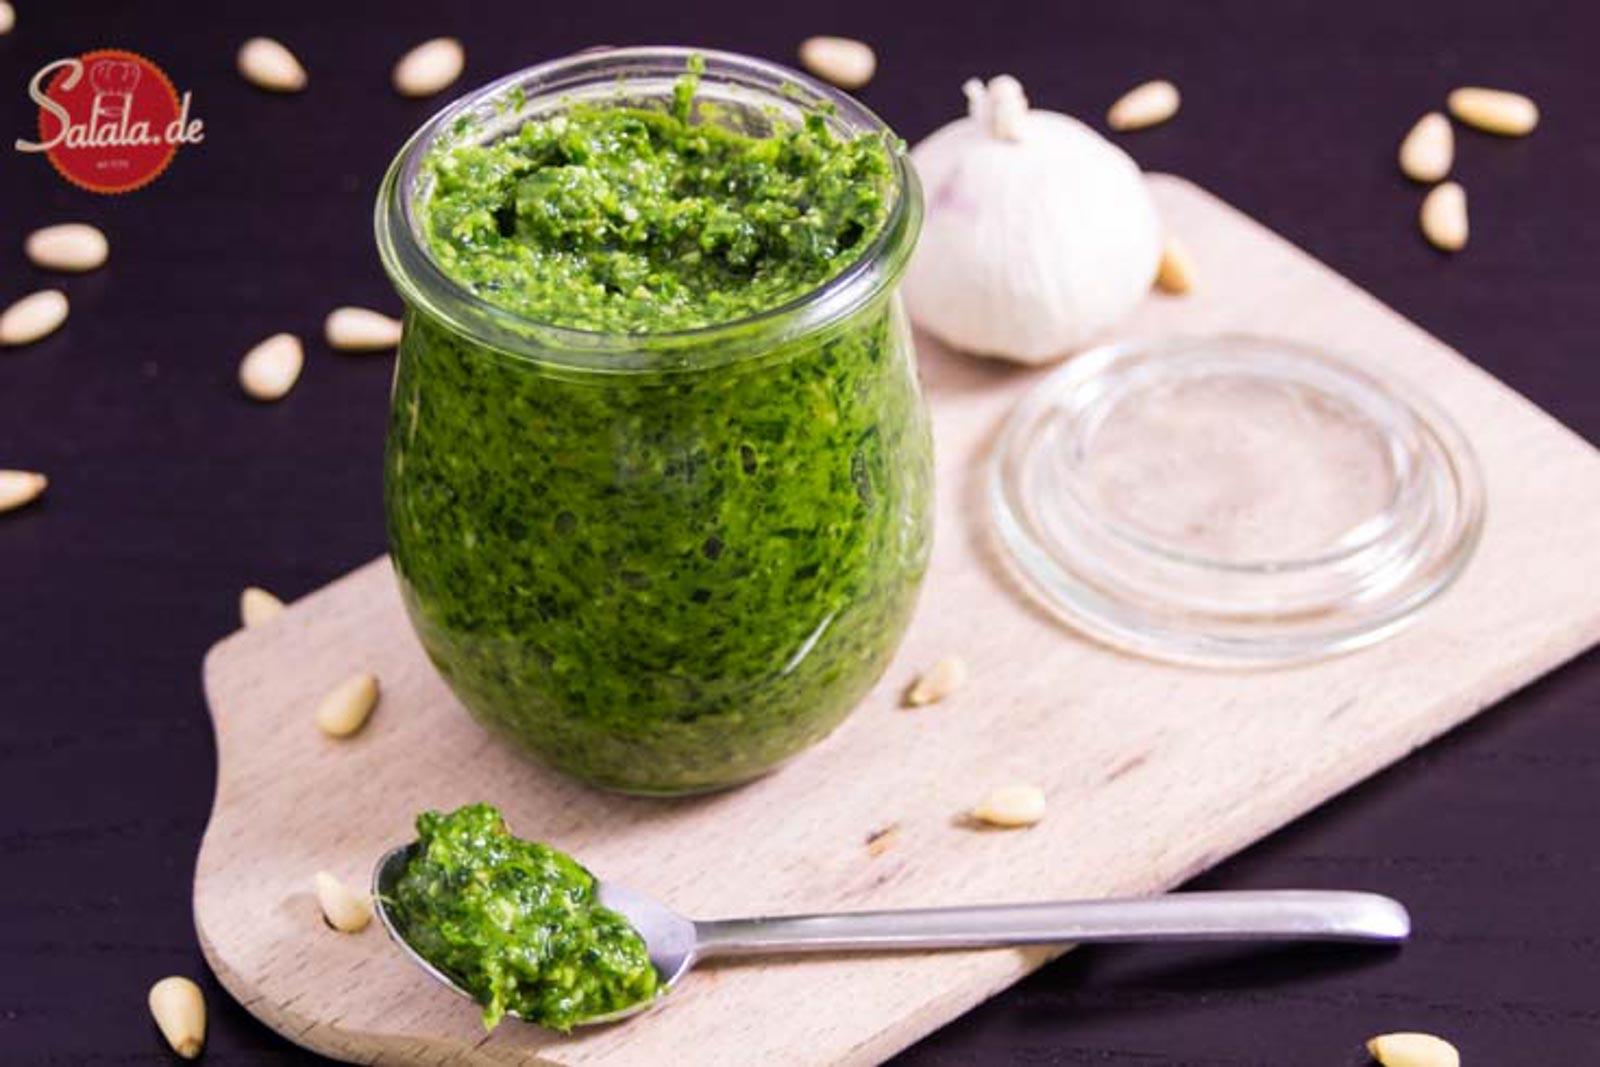 bärlauch-pesto grünes pesto low carb glutenfrei salala.de